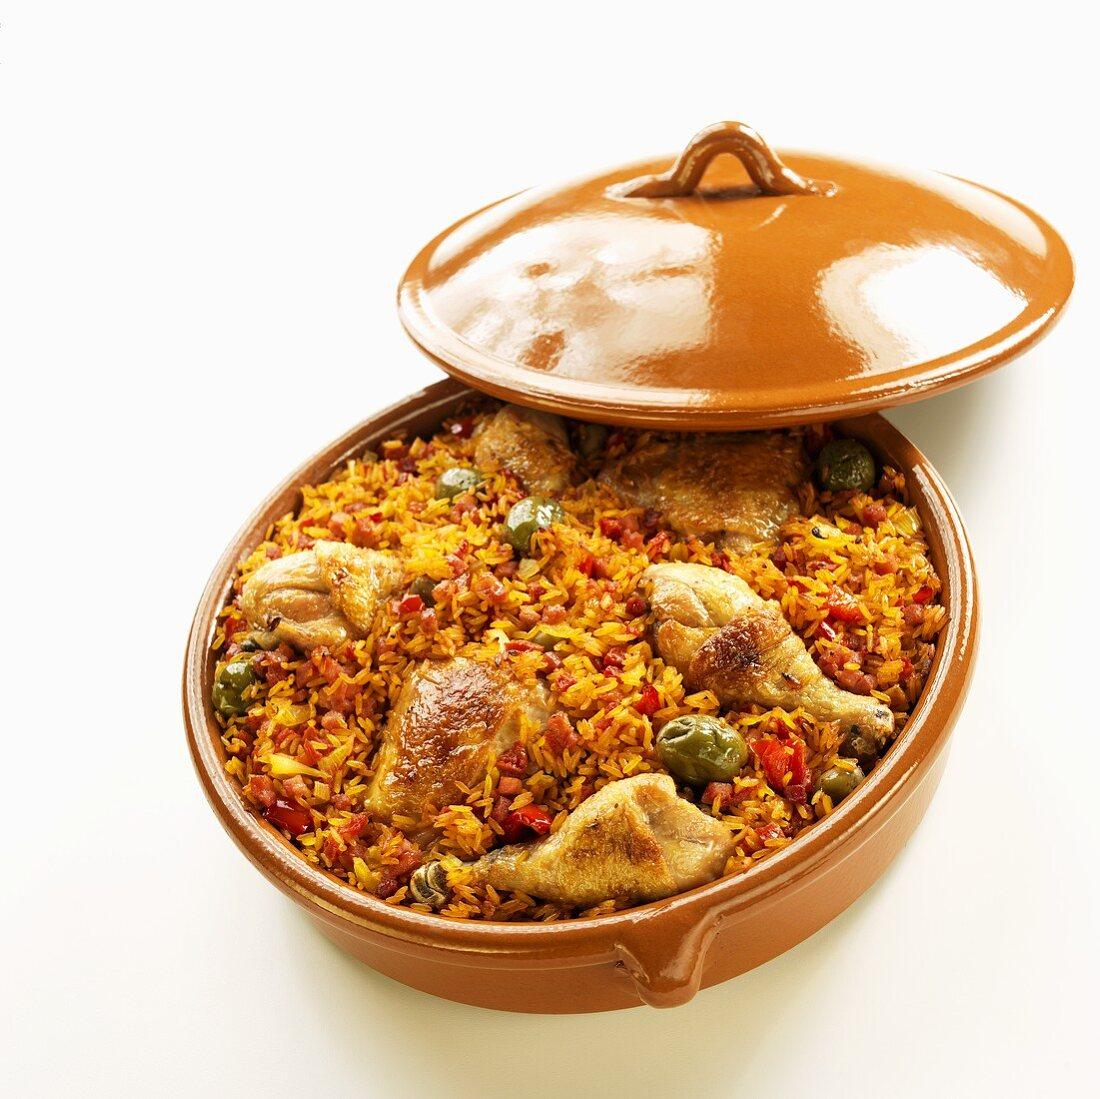 Arroz con Pollo; Latin Rice with Chicken